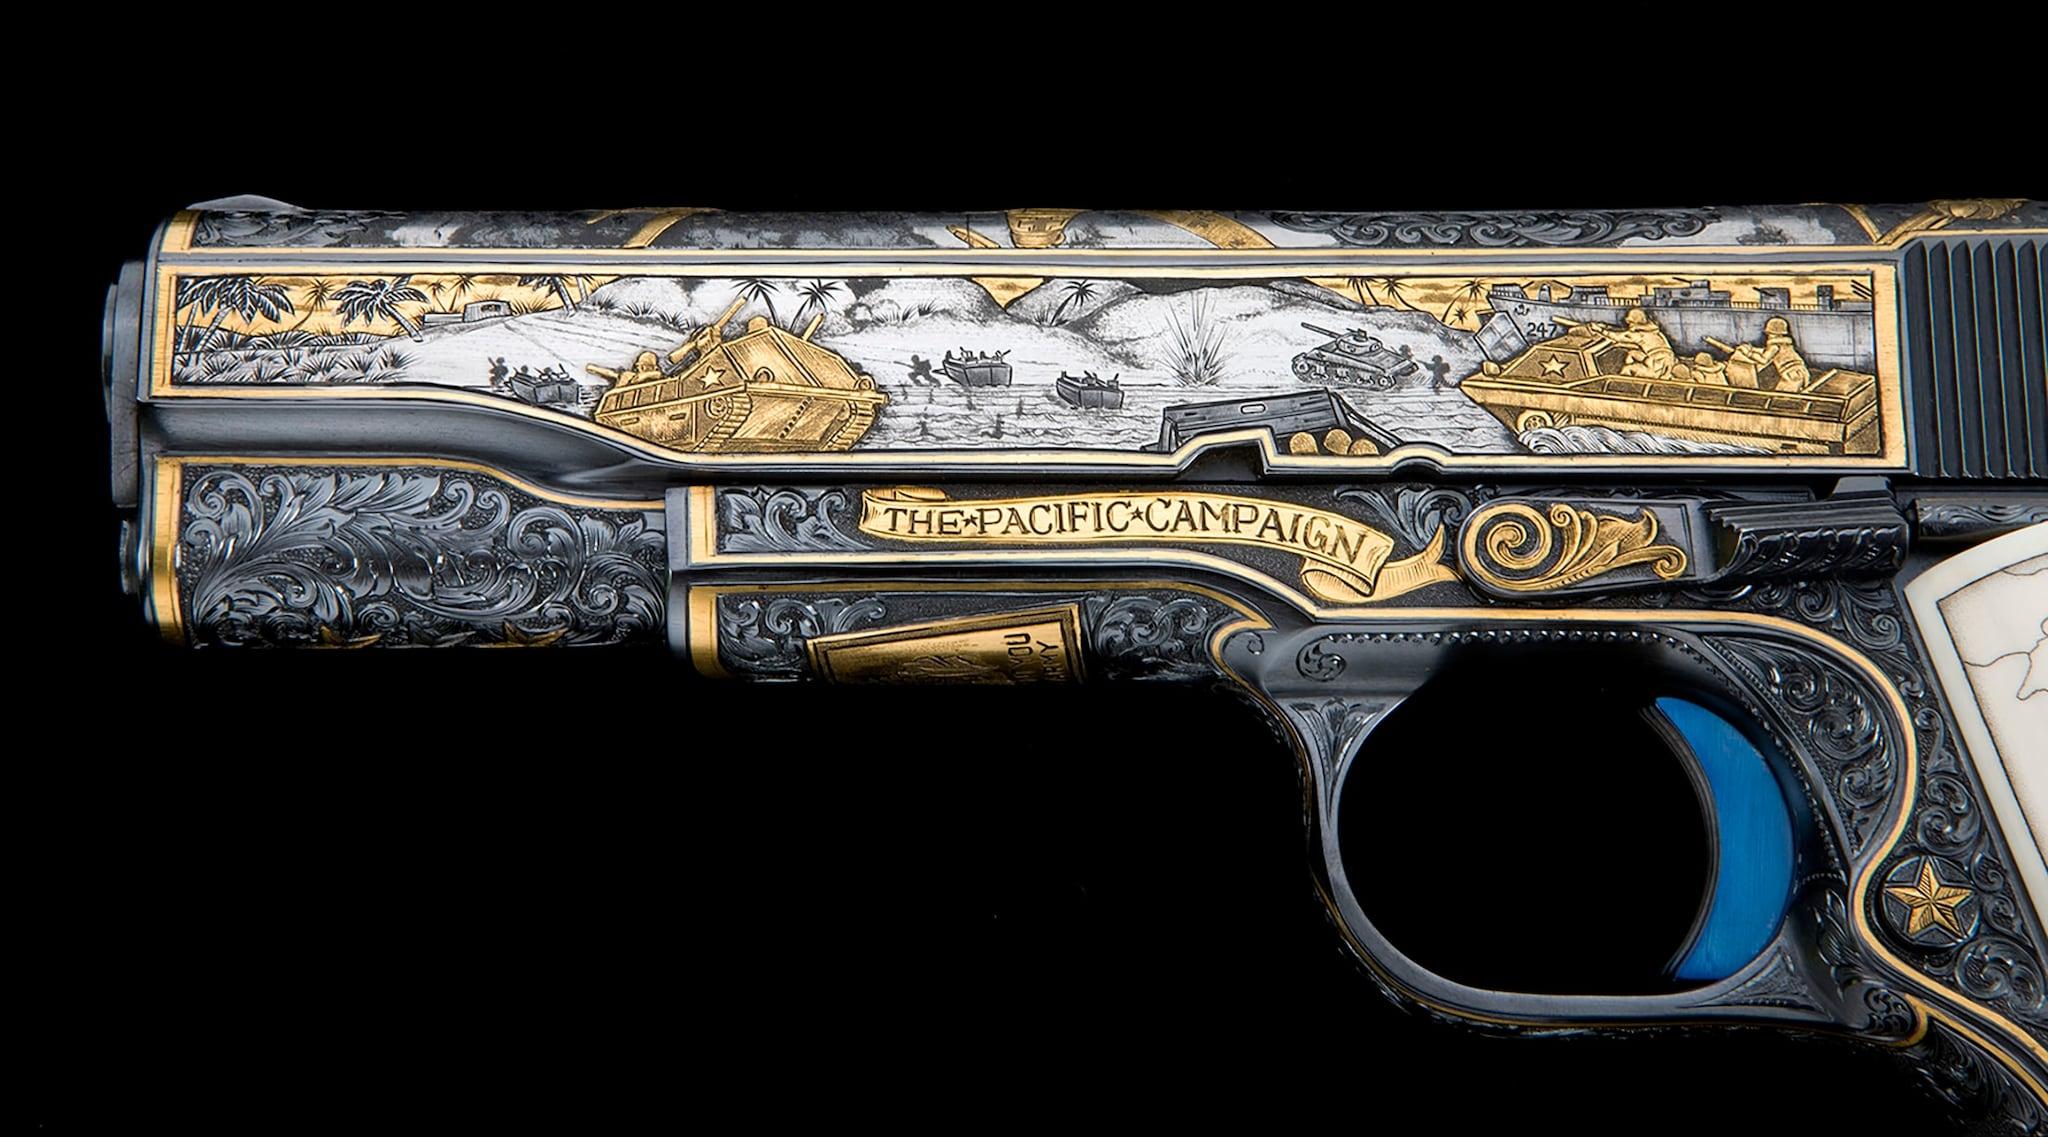 Greatest Generation Colt - Model of 1911 Colt A1 .45 cal (Photo: Michael Dubber)